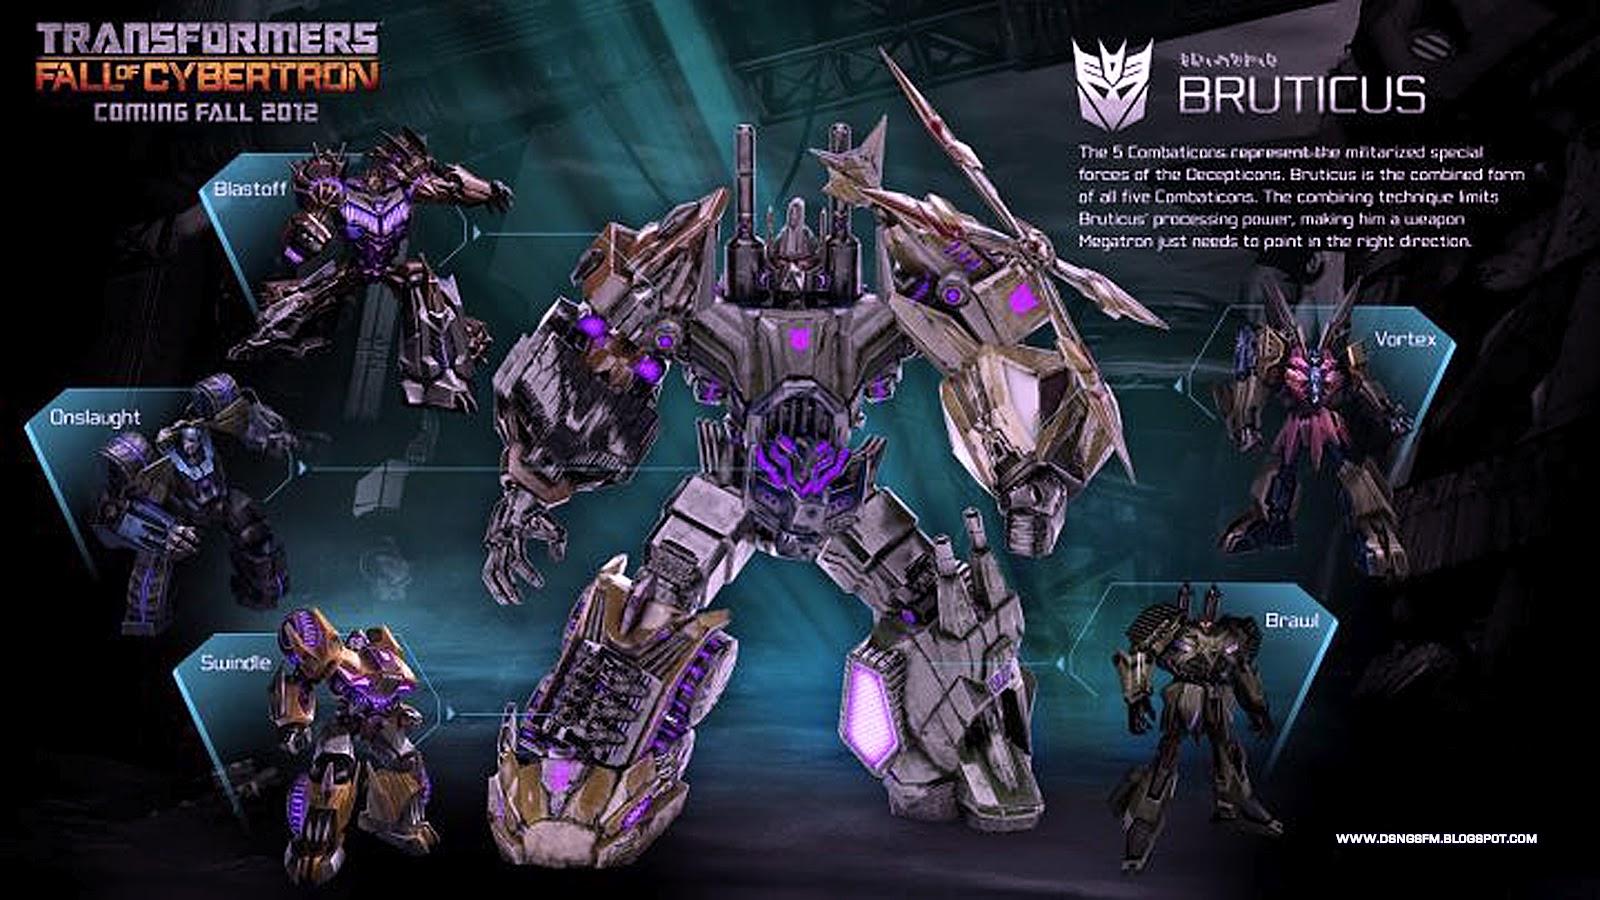 Fall Of Cybertron Wallpaper Hd Dsng S Sci Fi Megaverse Transformers Fall Of Cybertron